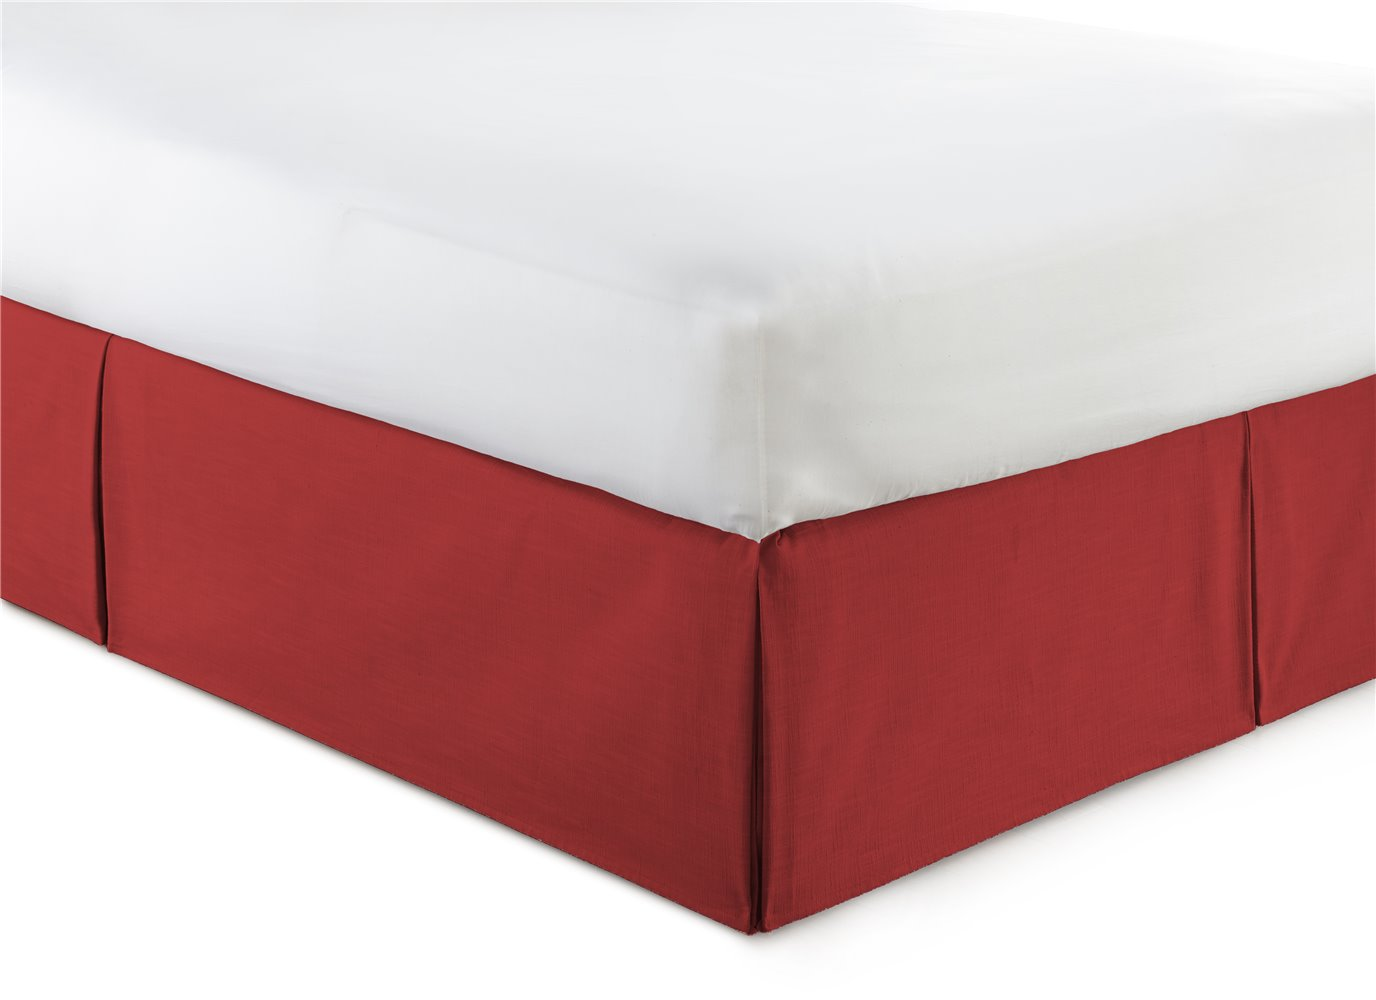 "Cambric Red Bedskirt 18"" Drop California King"